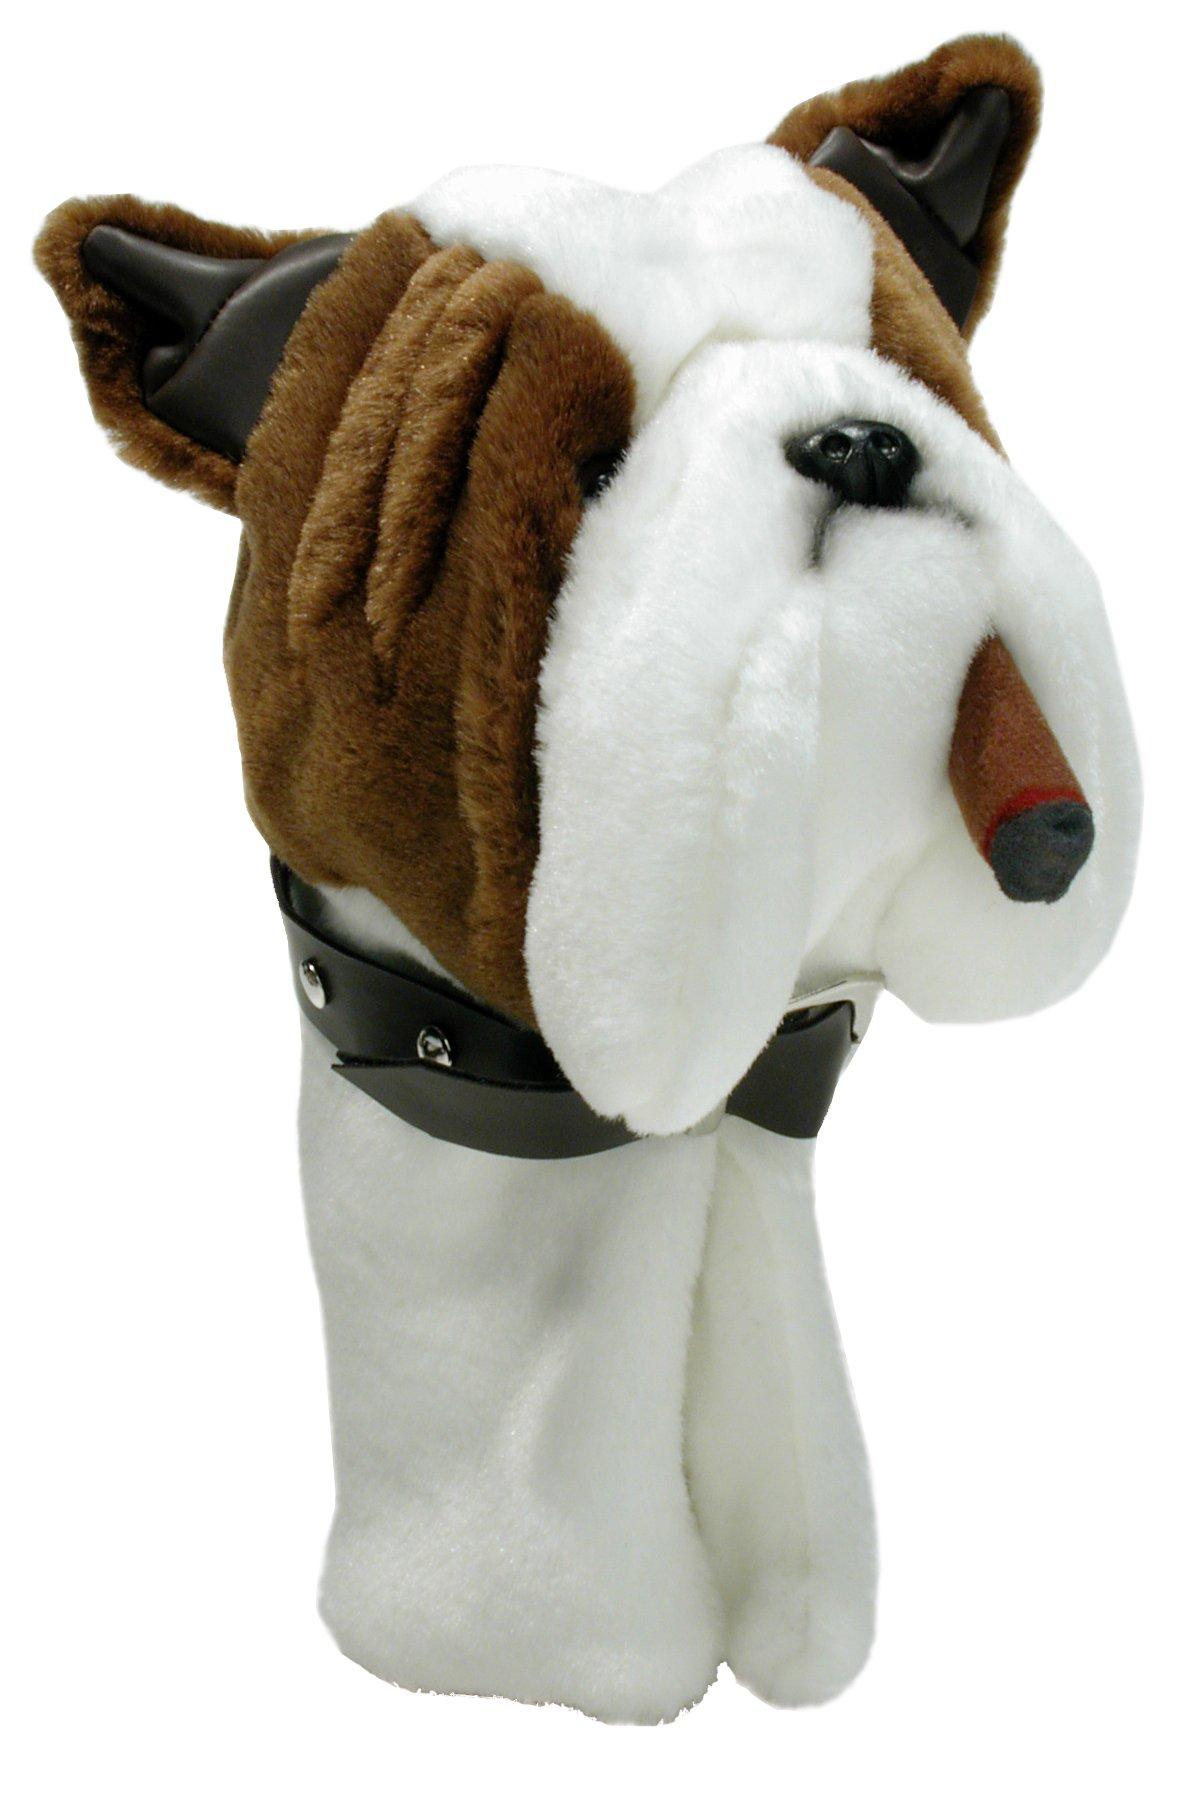 ProActive Sports Zoo Golf 460 cc Headcover - Bulldog w/ Cigar by ProActive Sports